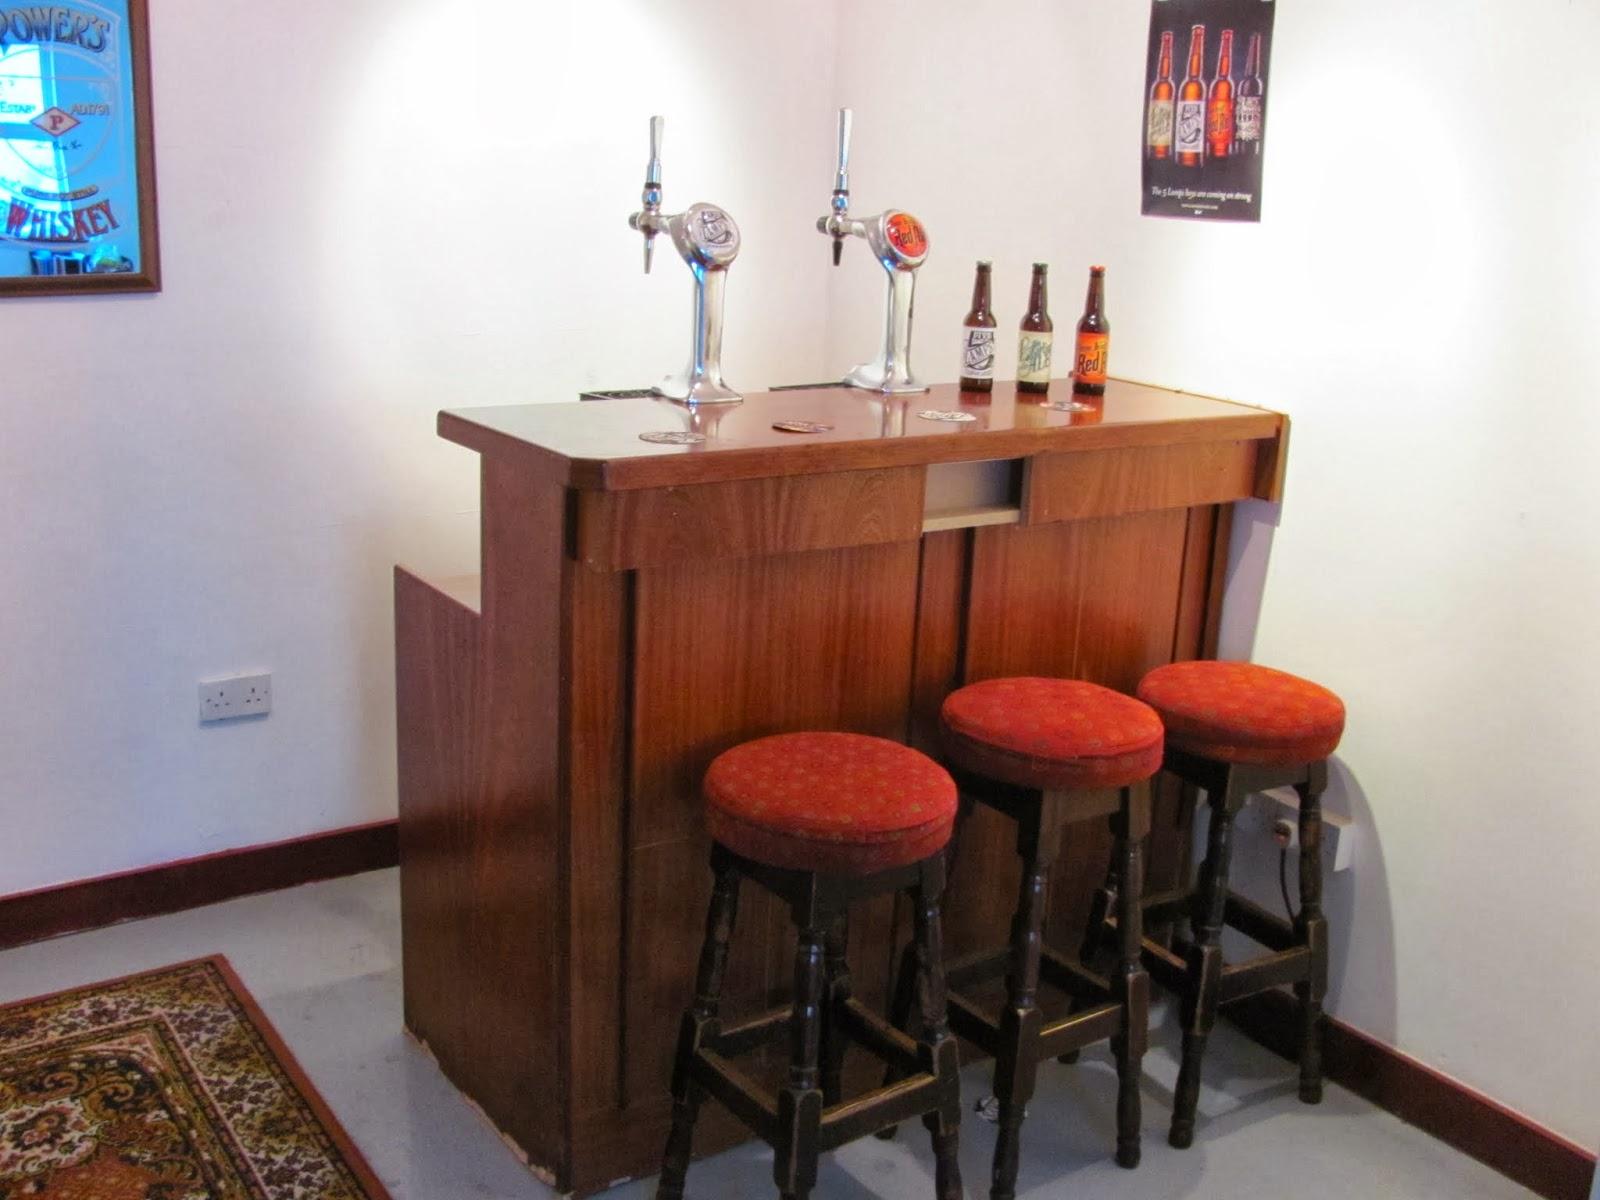 Tasting Room Bar at 5 Lamps Dublin Brewery